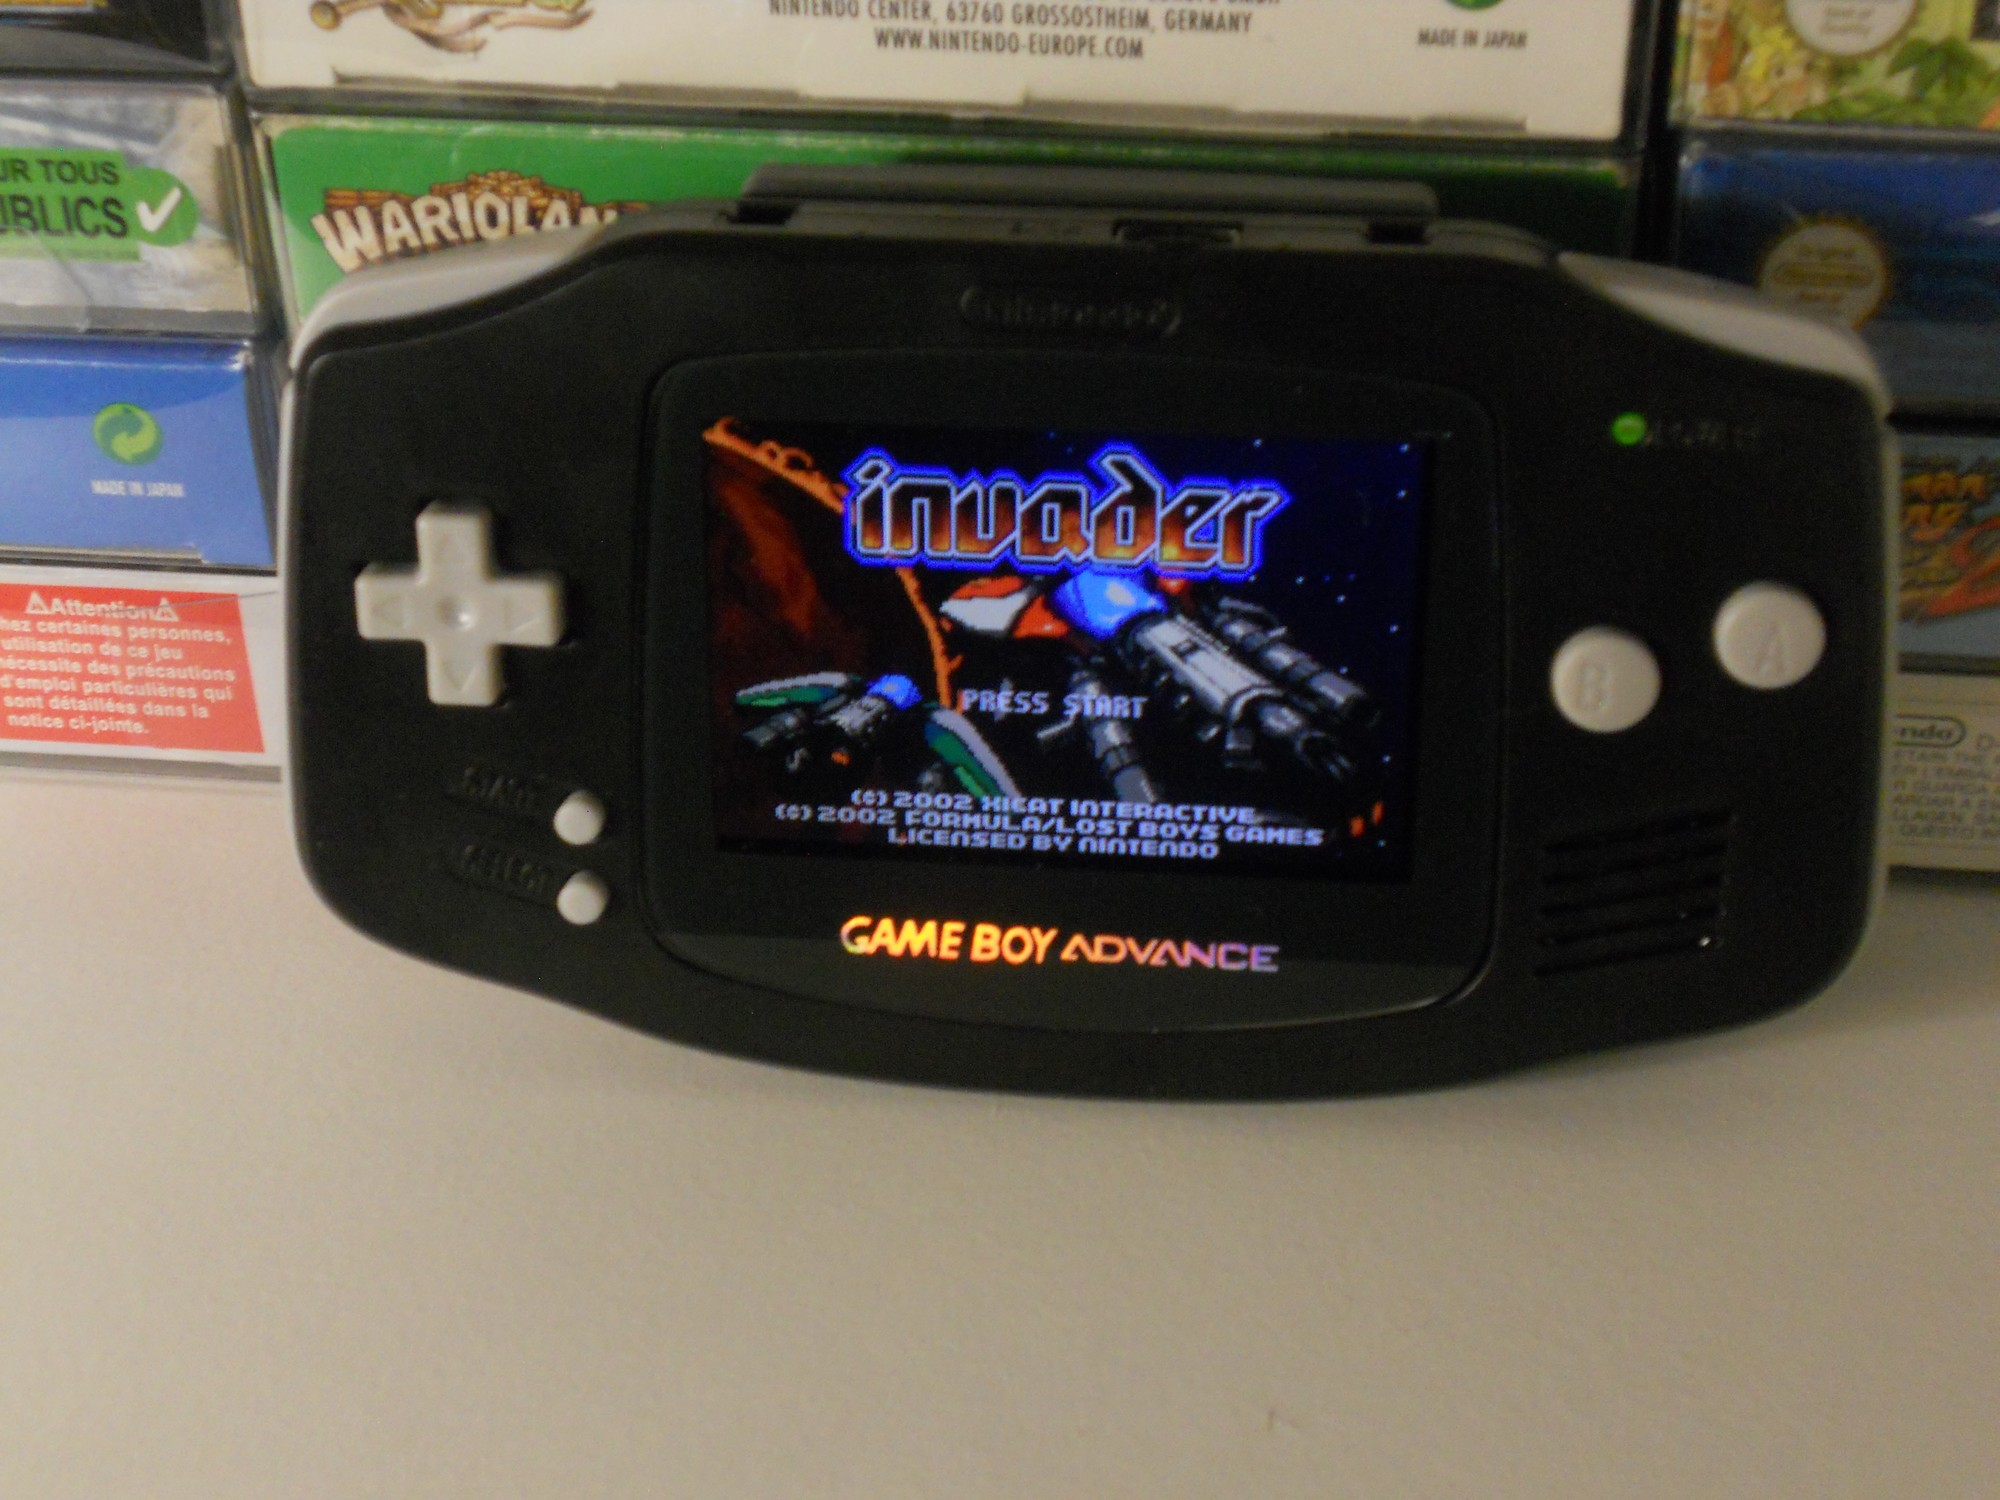 NINTENDO GameBoy Advance - Page 2 QxVfwX